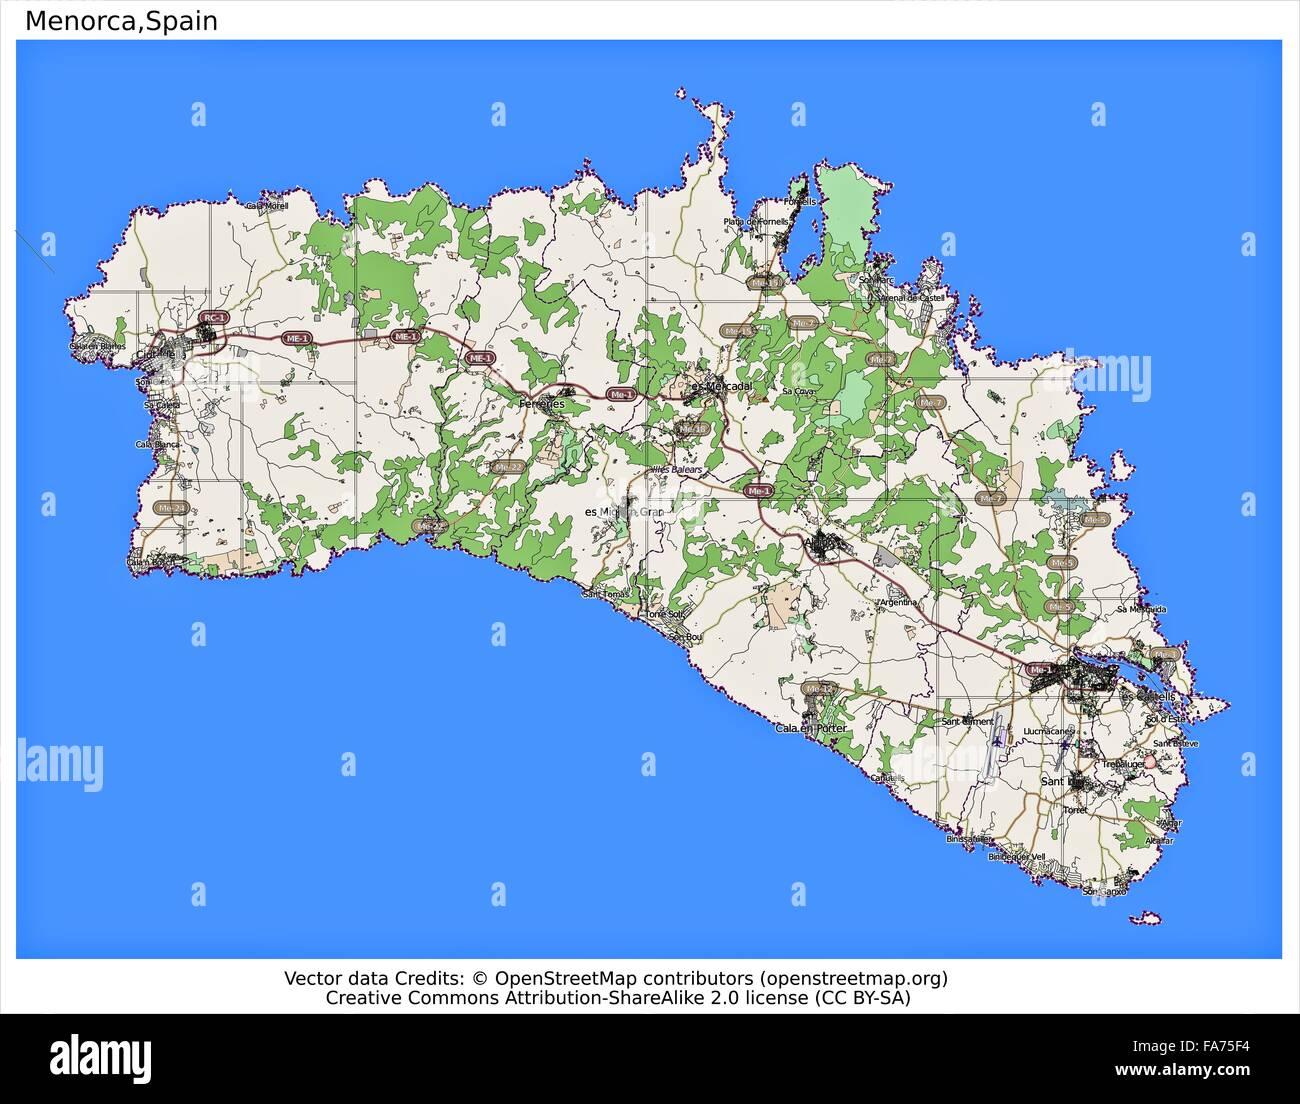 Menorca Spain Location Map Stock Photo 92356408 Alamy